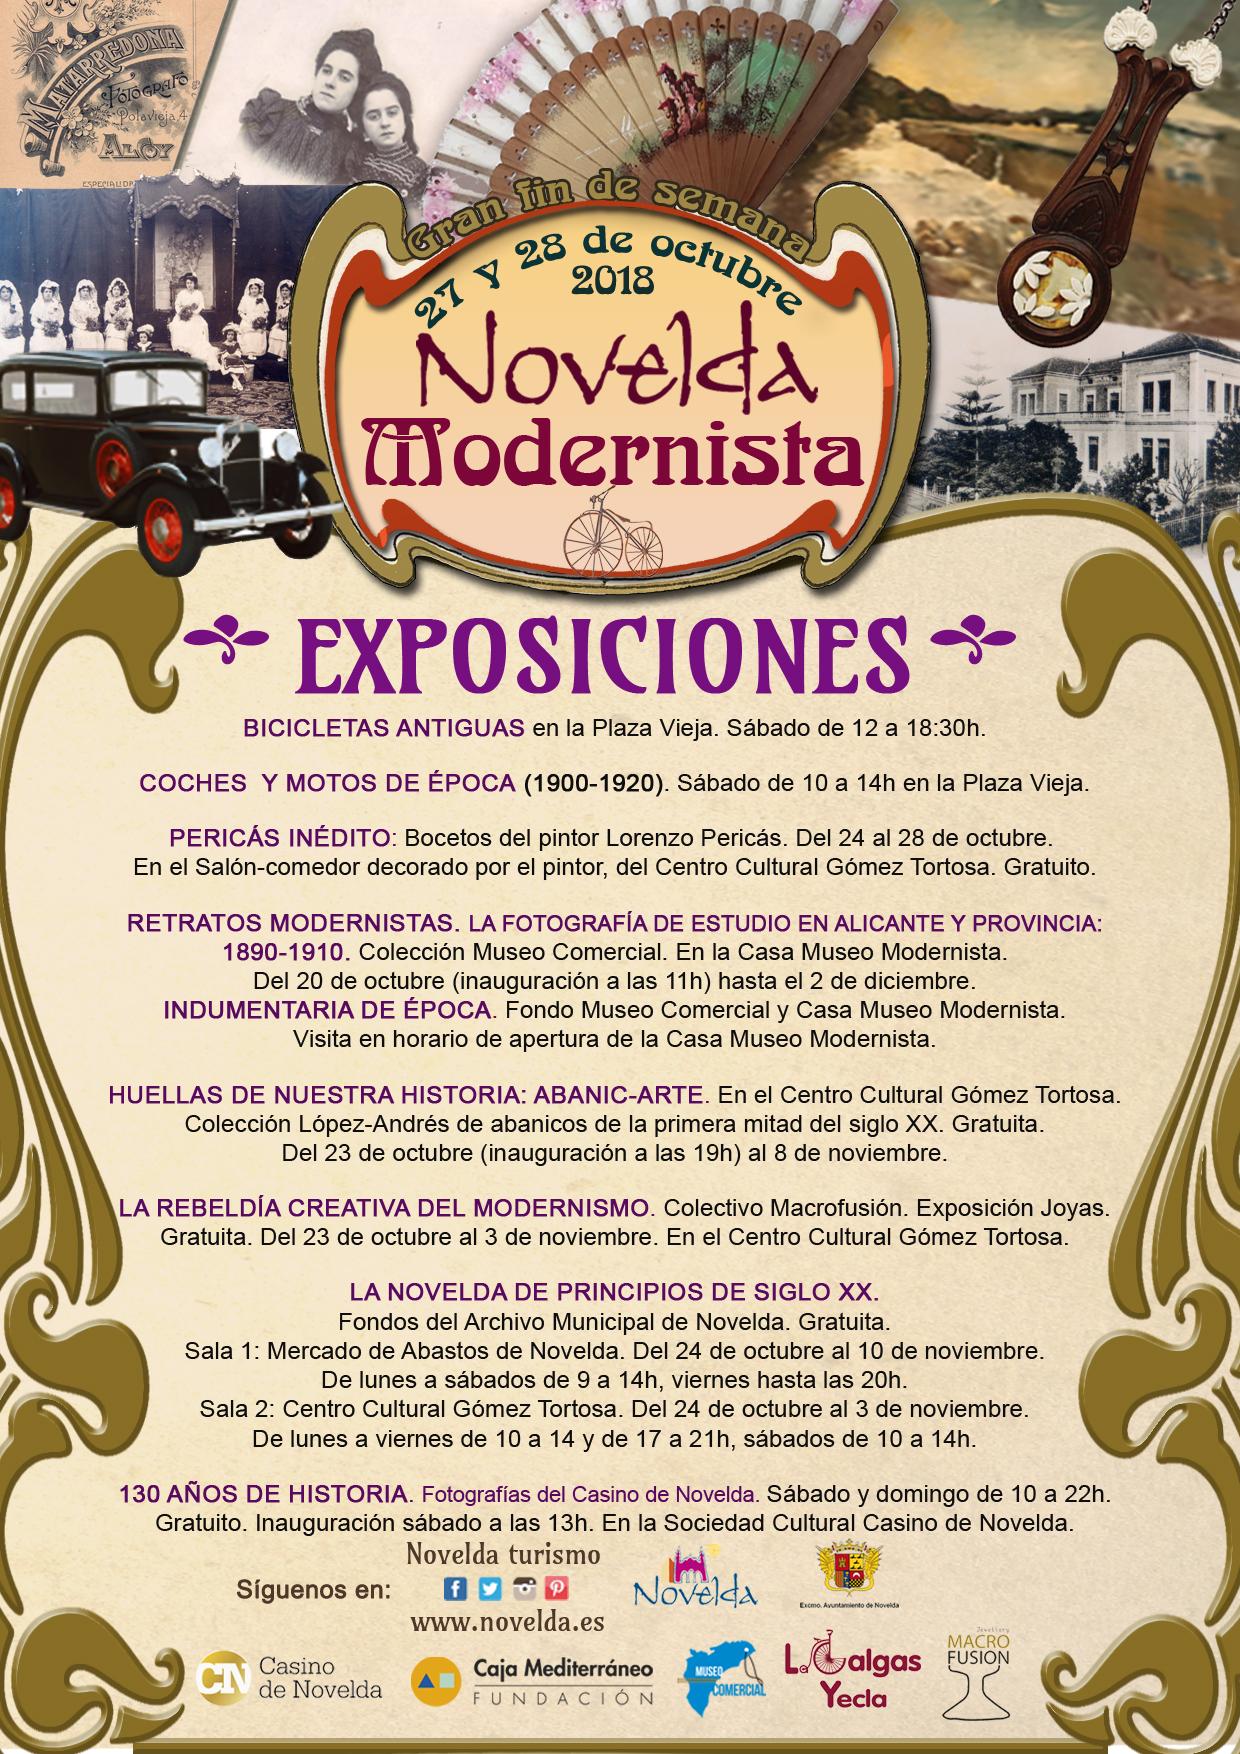 EXPOSICIONES Novelda modernista